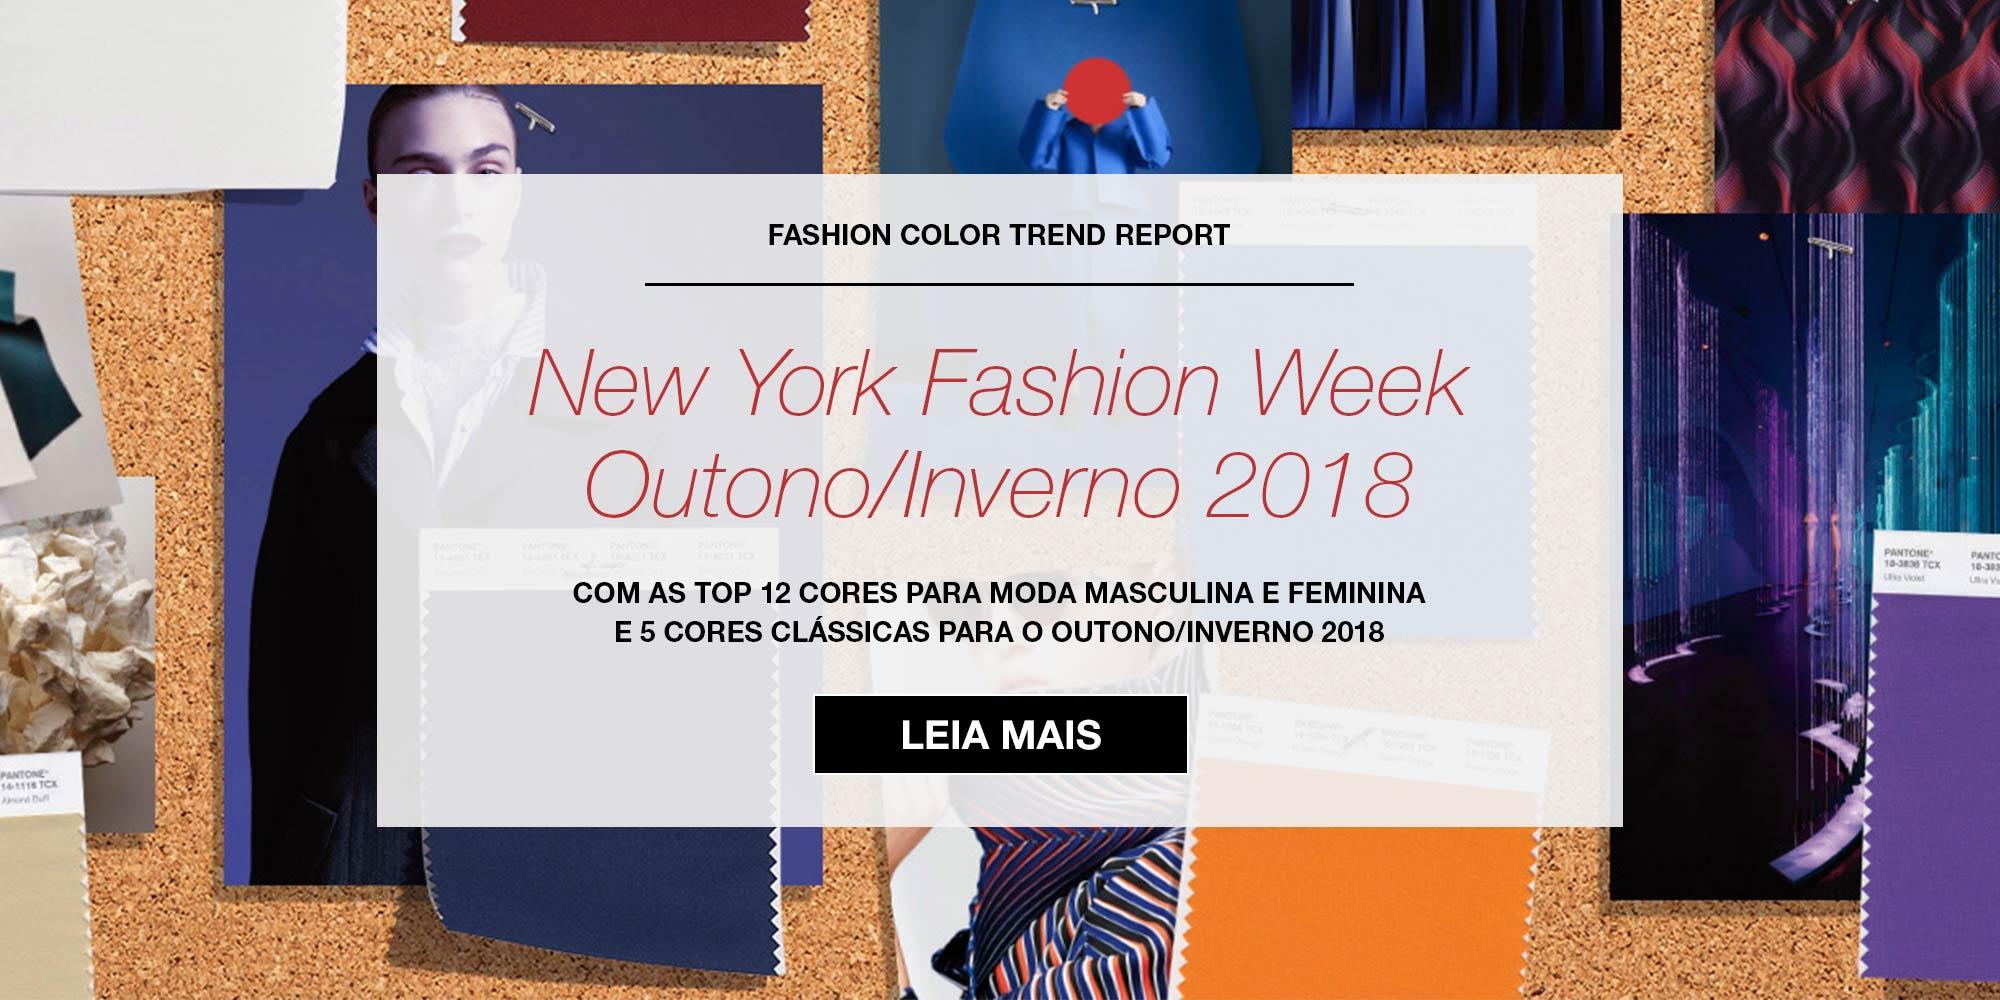 FCR - New York Fashion Week Outono Inverno 2018